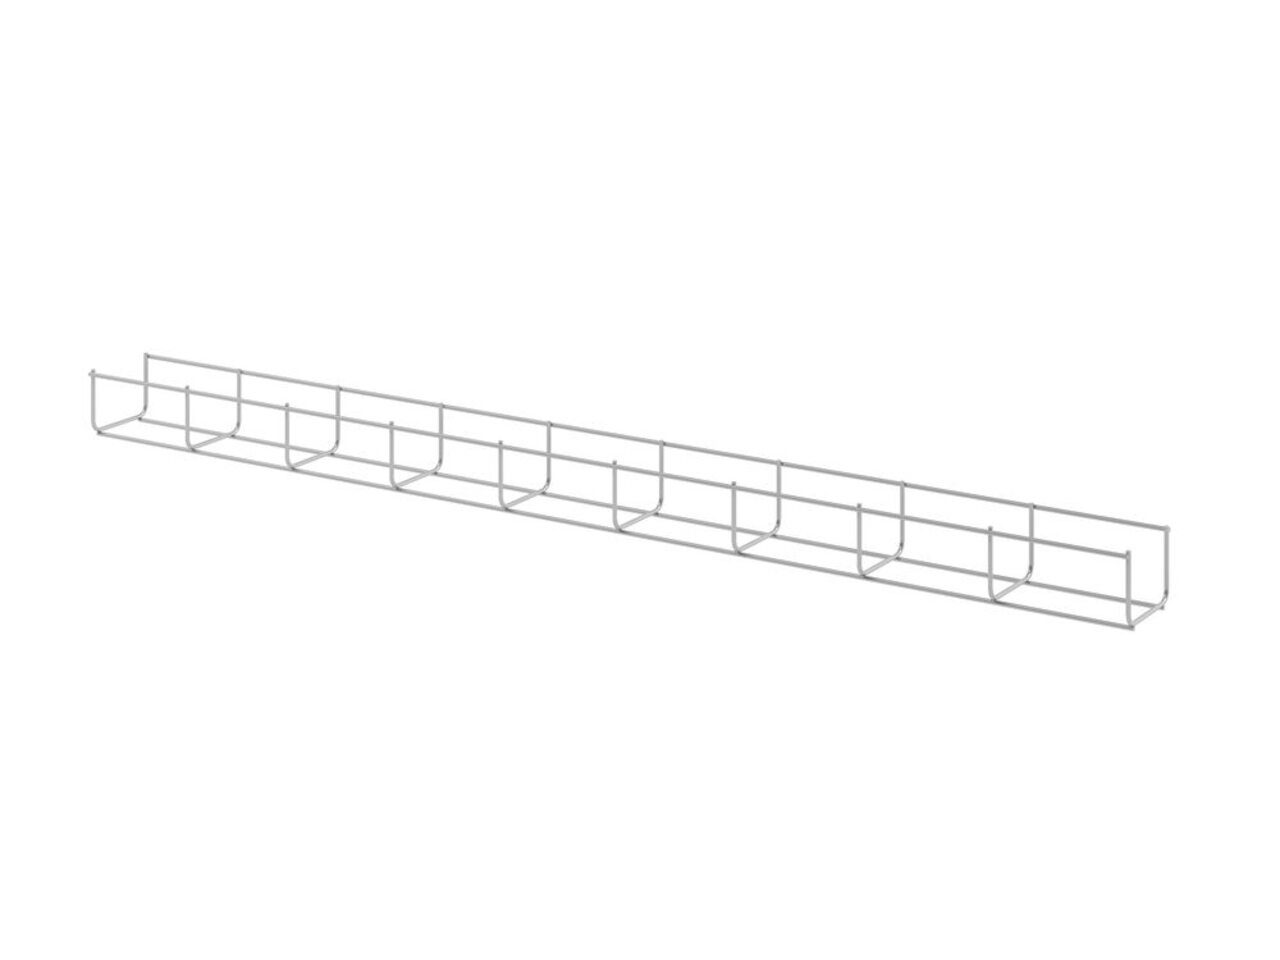 Лоток для проводов  Инновация 7x5x90 - фото 1